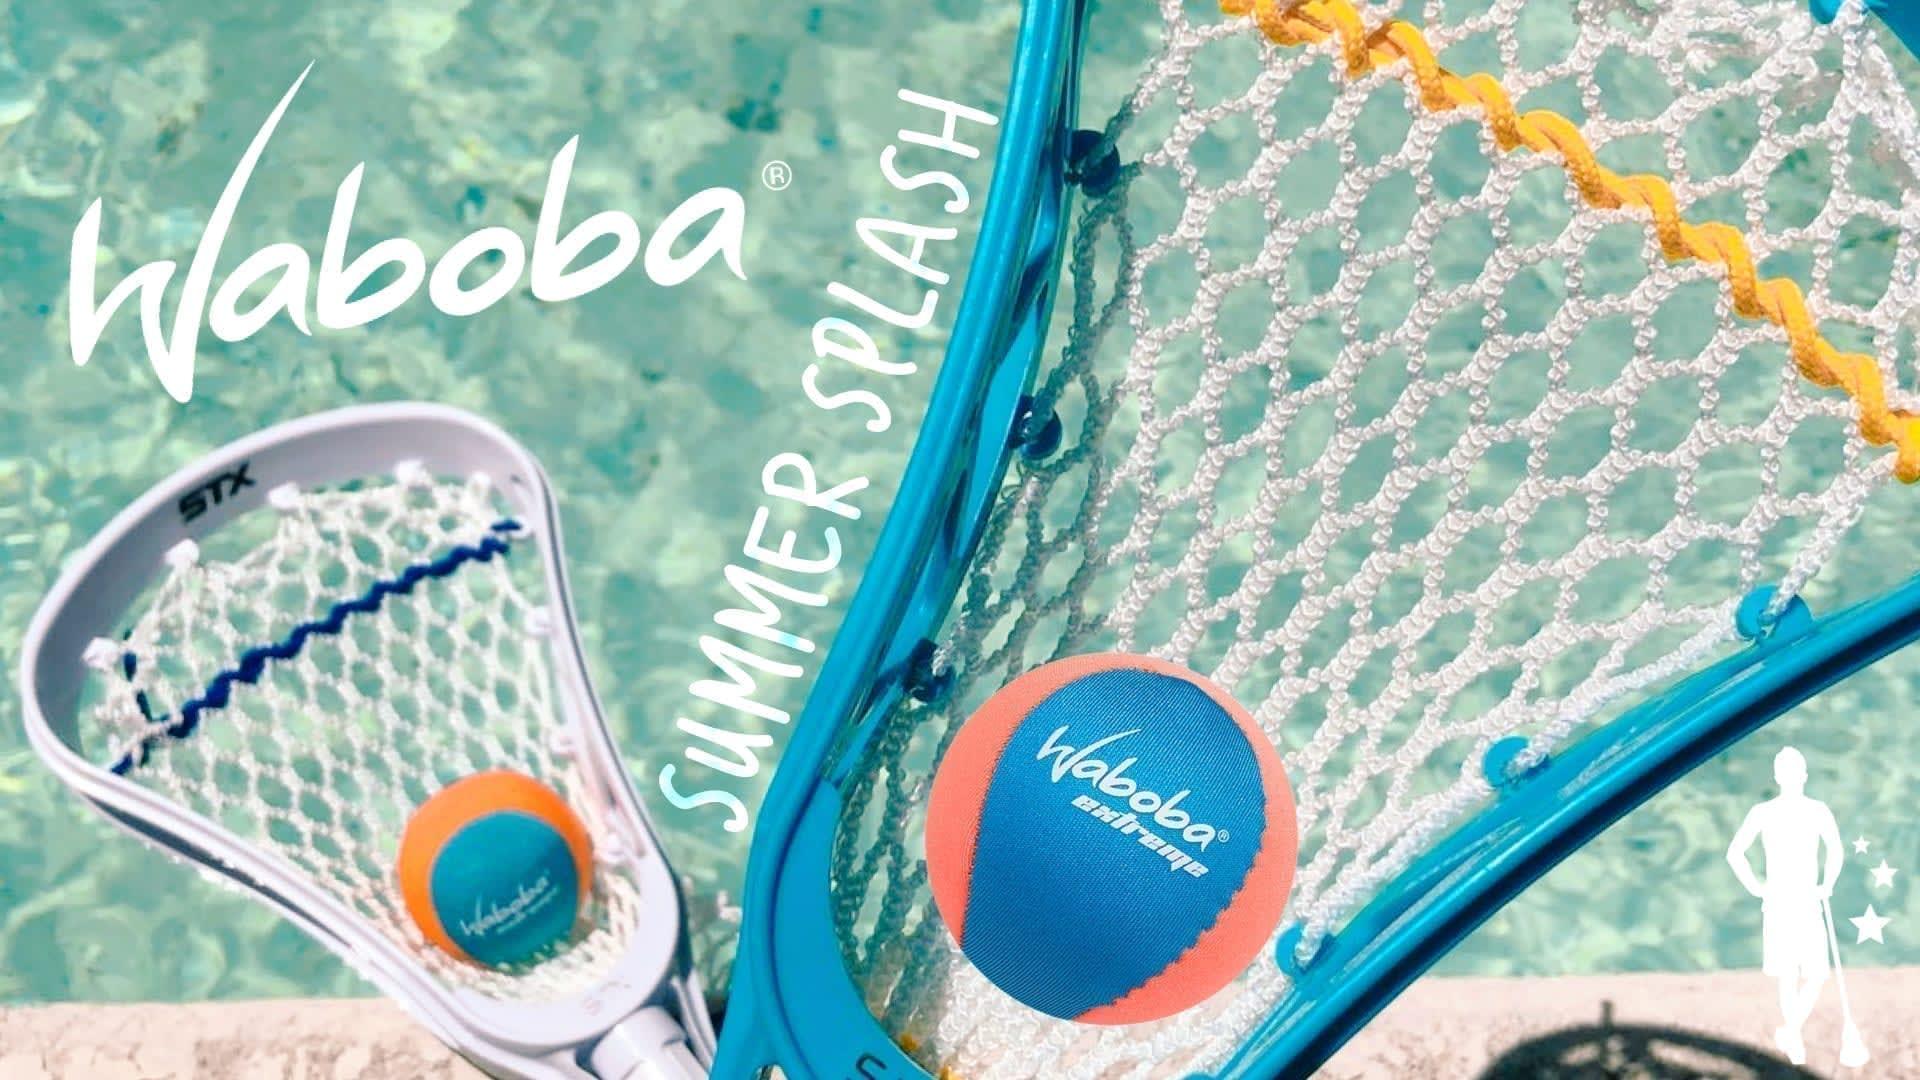 waboba summer splash challenge contest free waboba laxallstars lacrosse